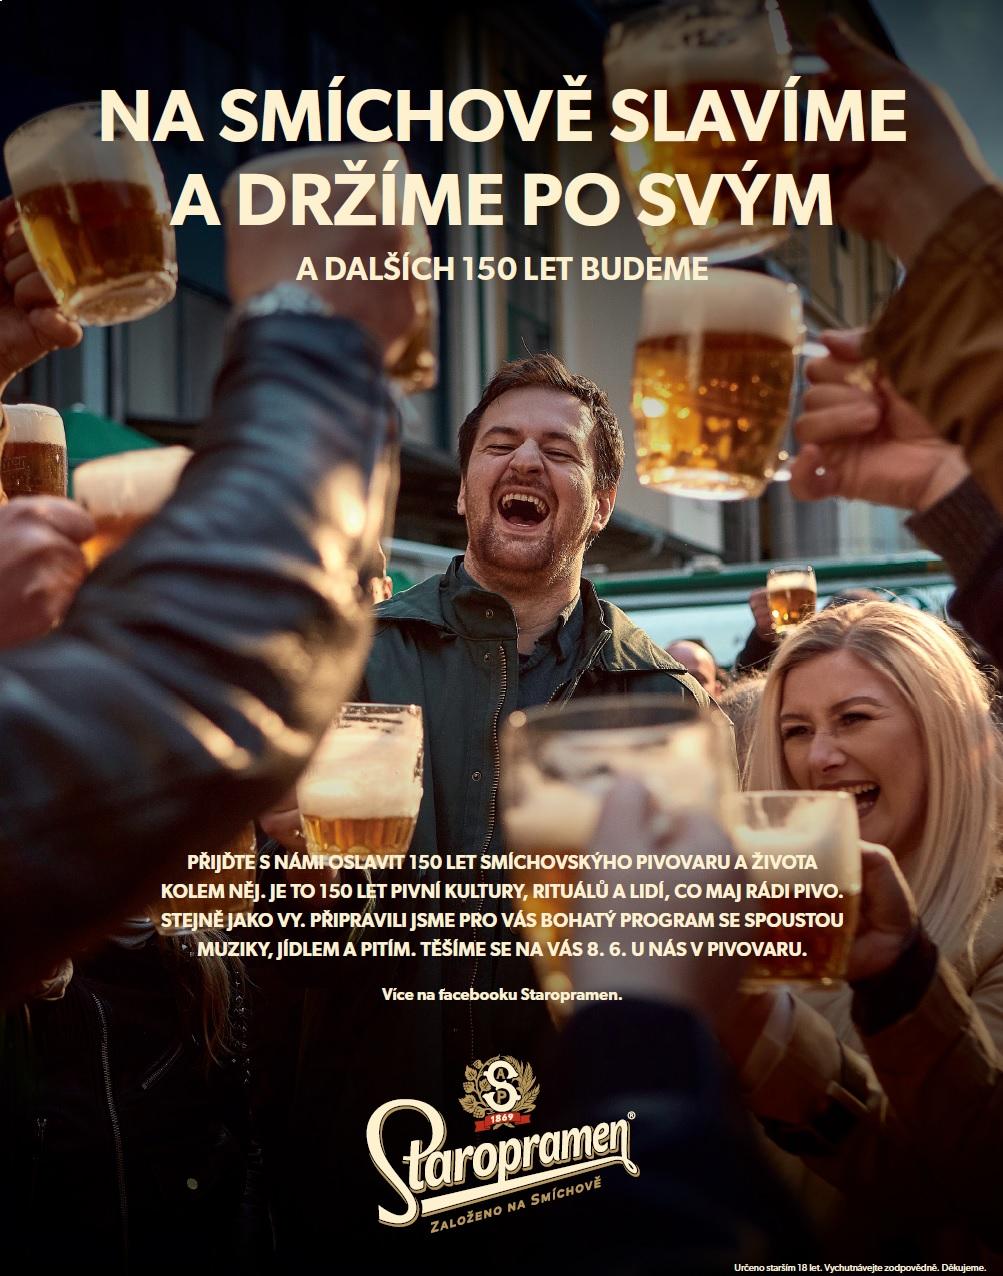 slavnosti-smichova-se-ponesou-v-duchu-oslav-vyroci-150-let-od-zalozeni-pivovaru-staropramen